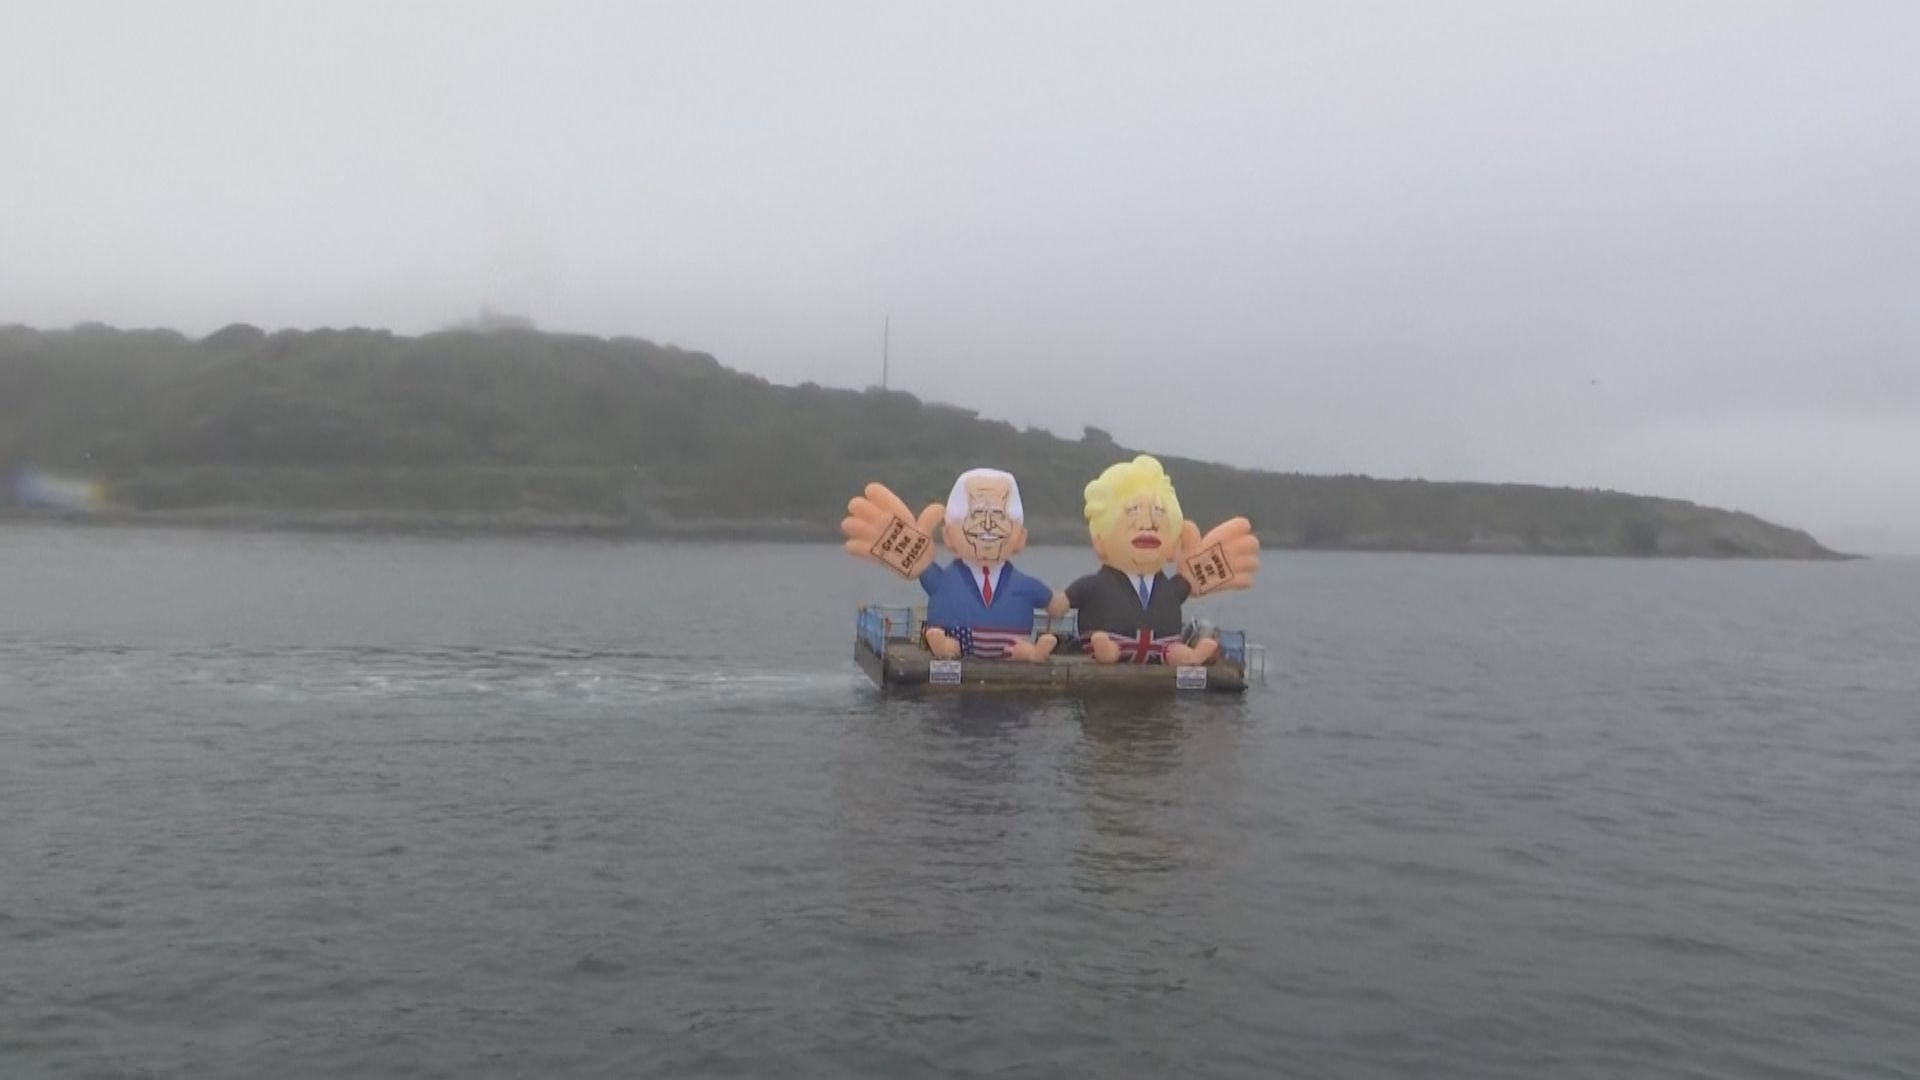 G7峰會召開在即 有組織展示約翰遜拜登吹氣公仔示威